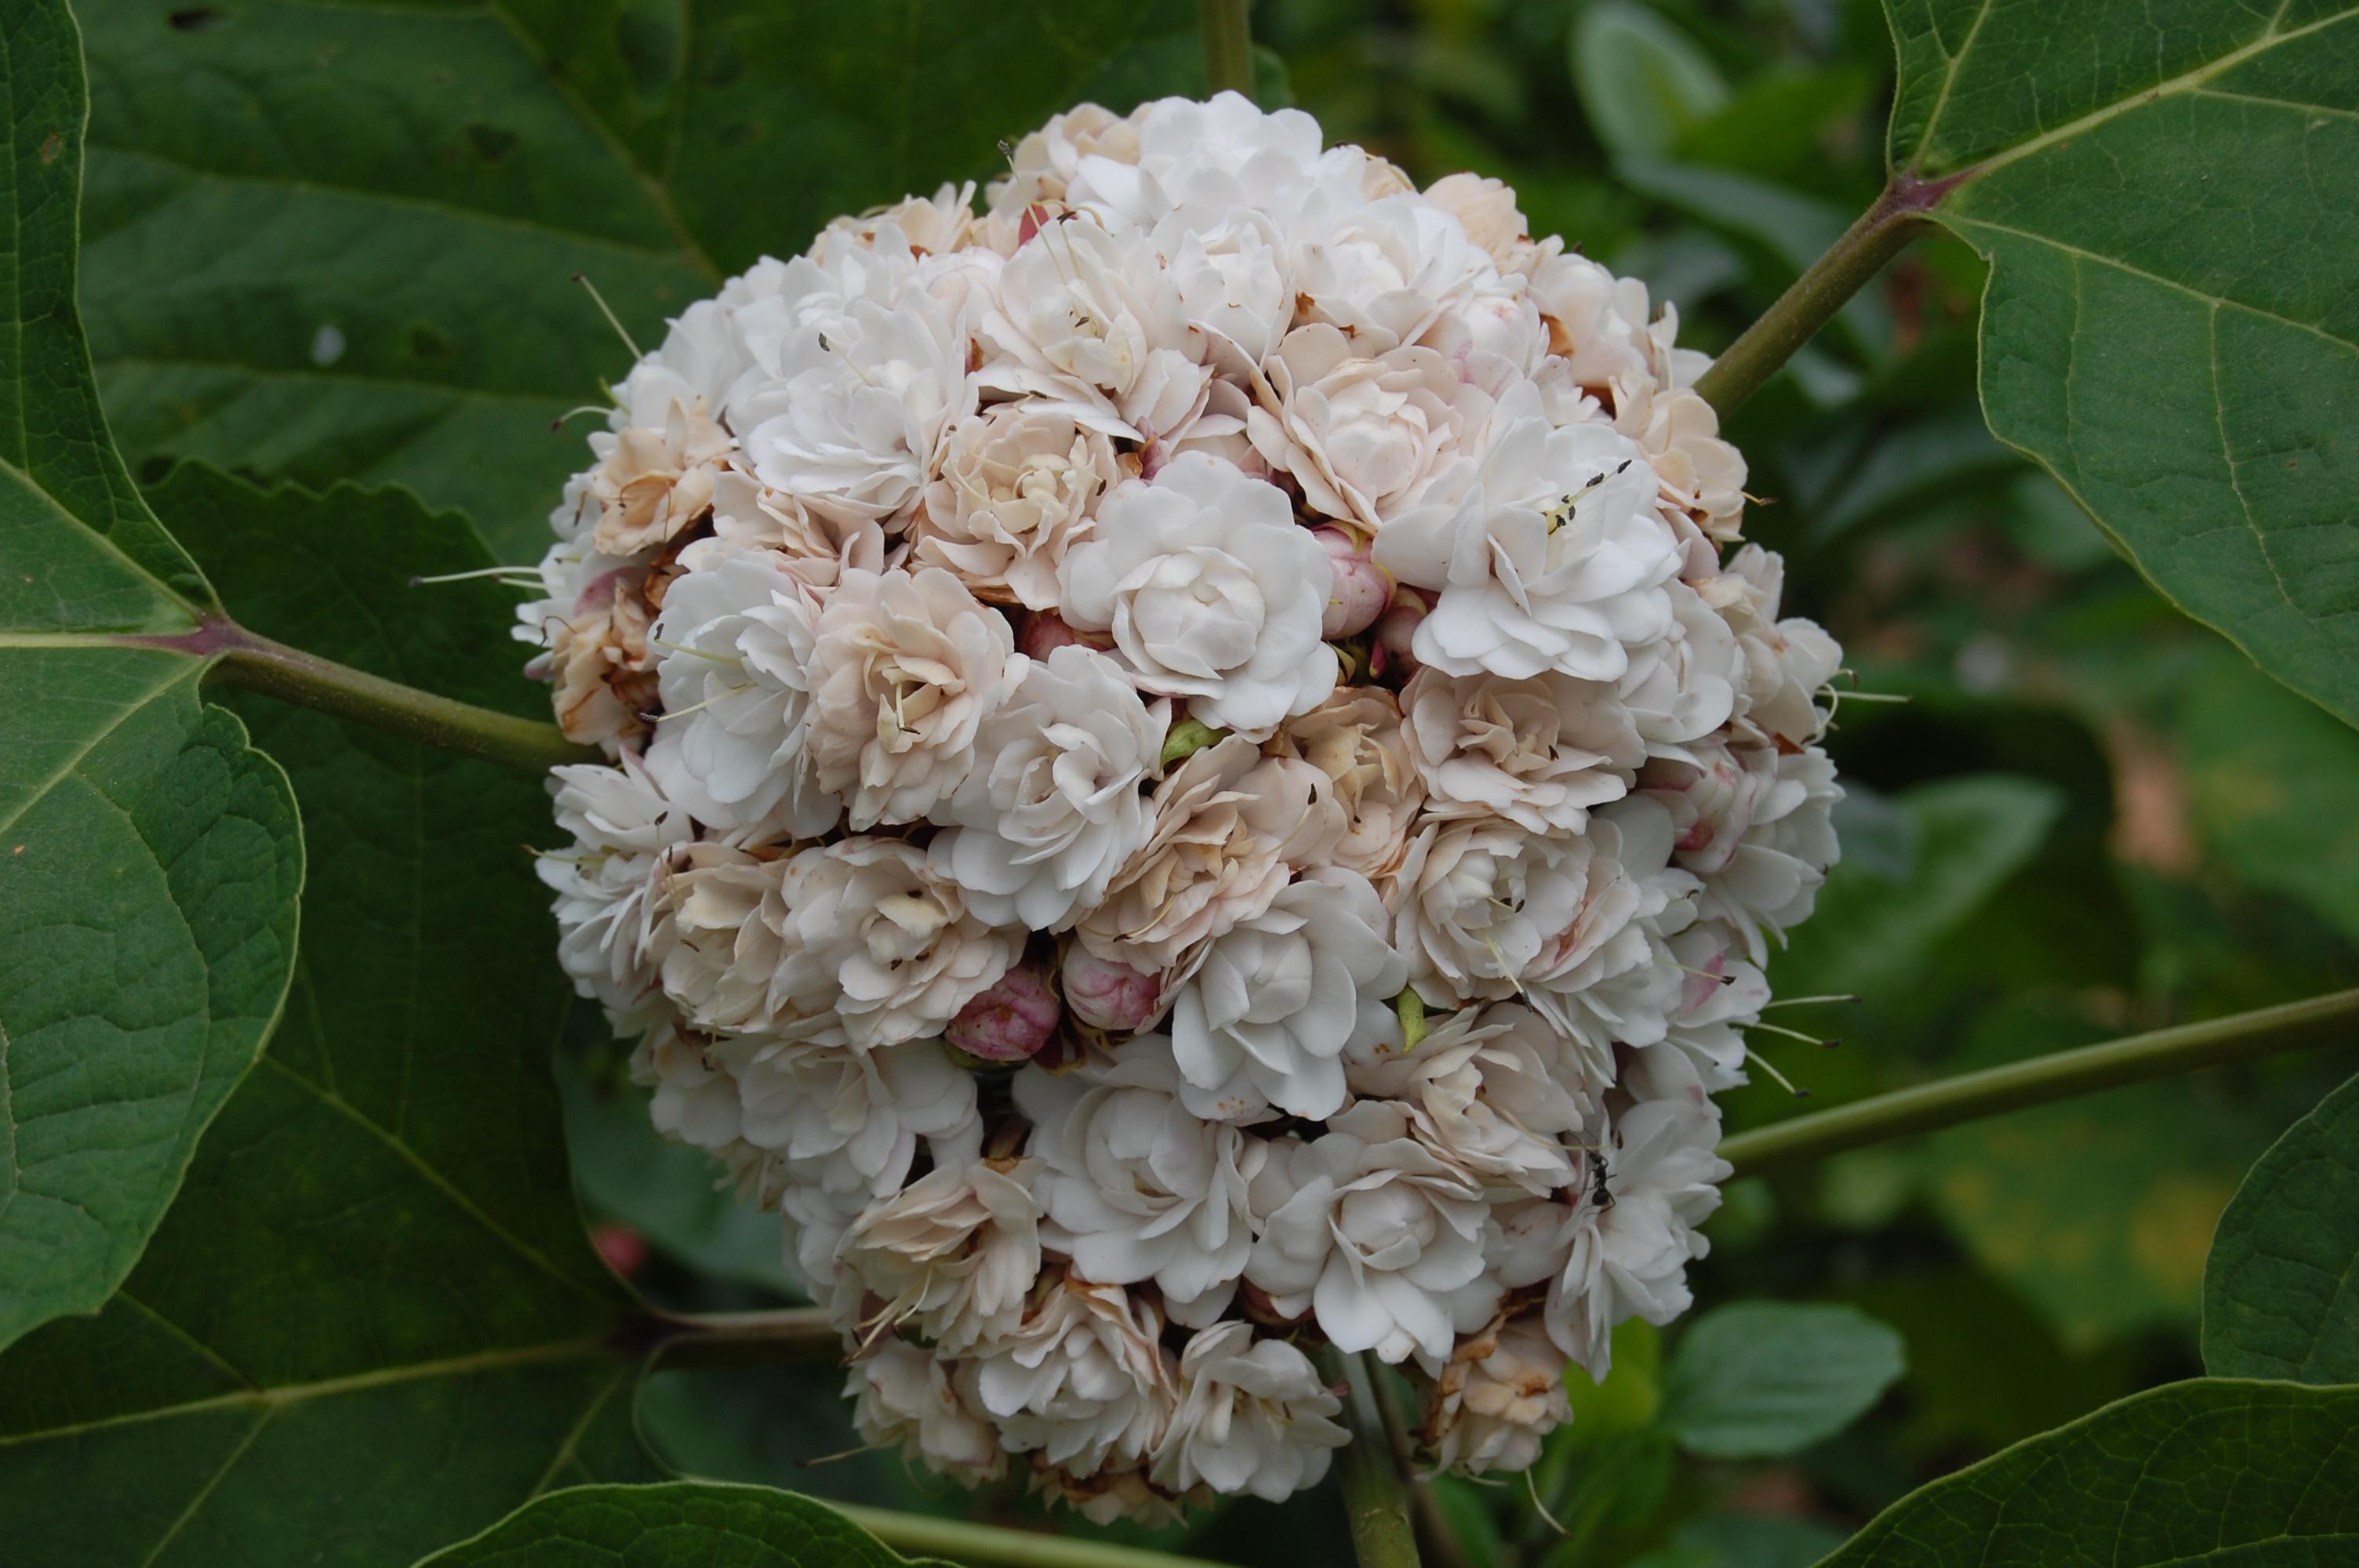 Cashmere Bouquet Flower Images - Flower Wallpaper HD